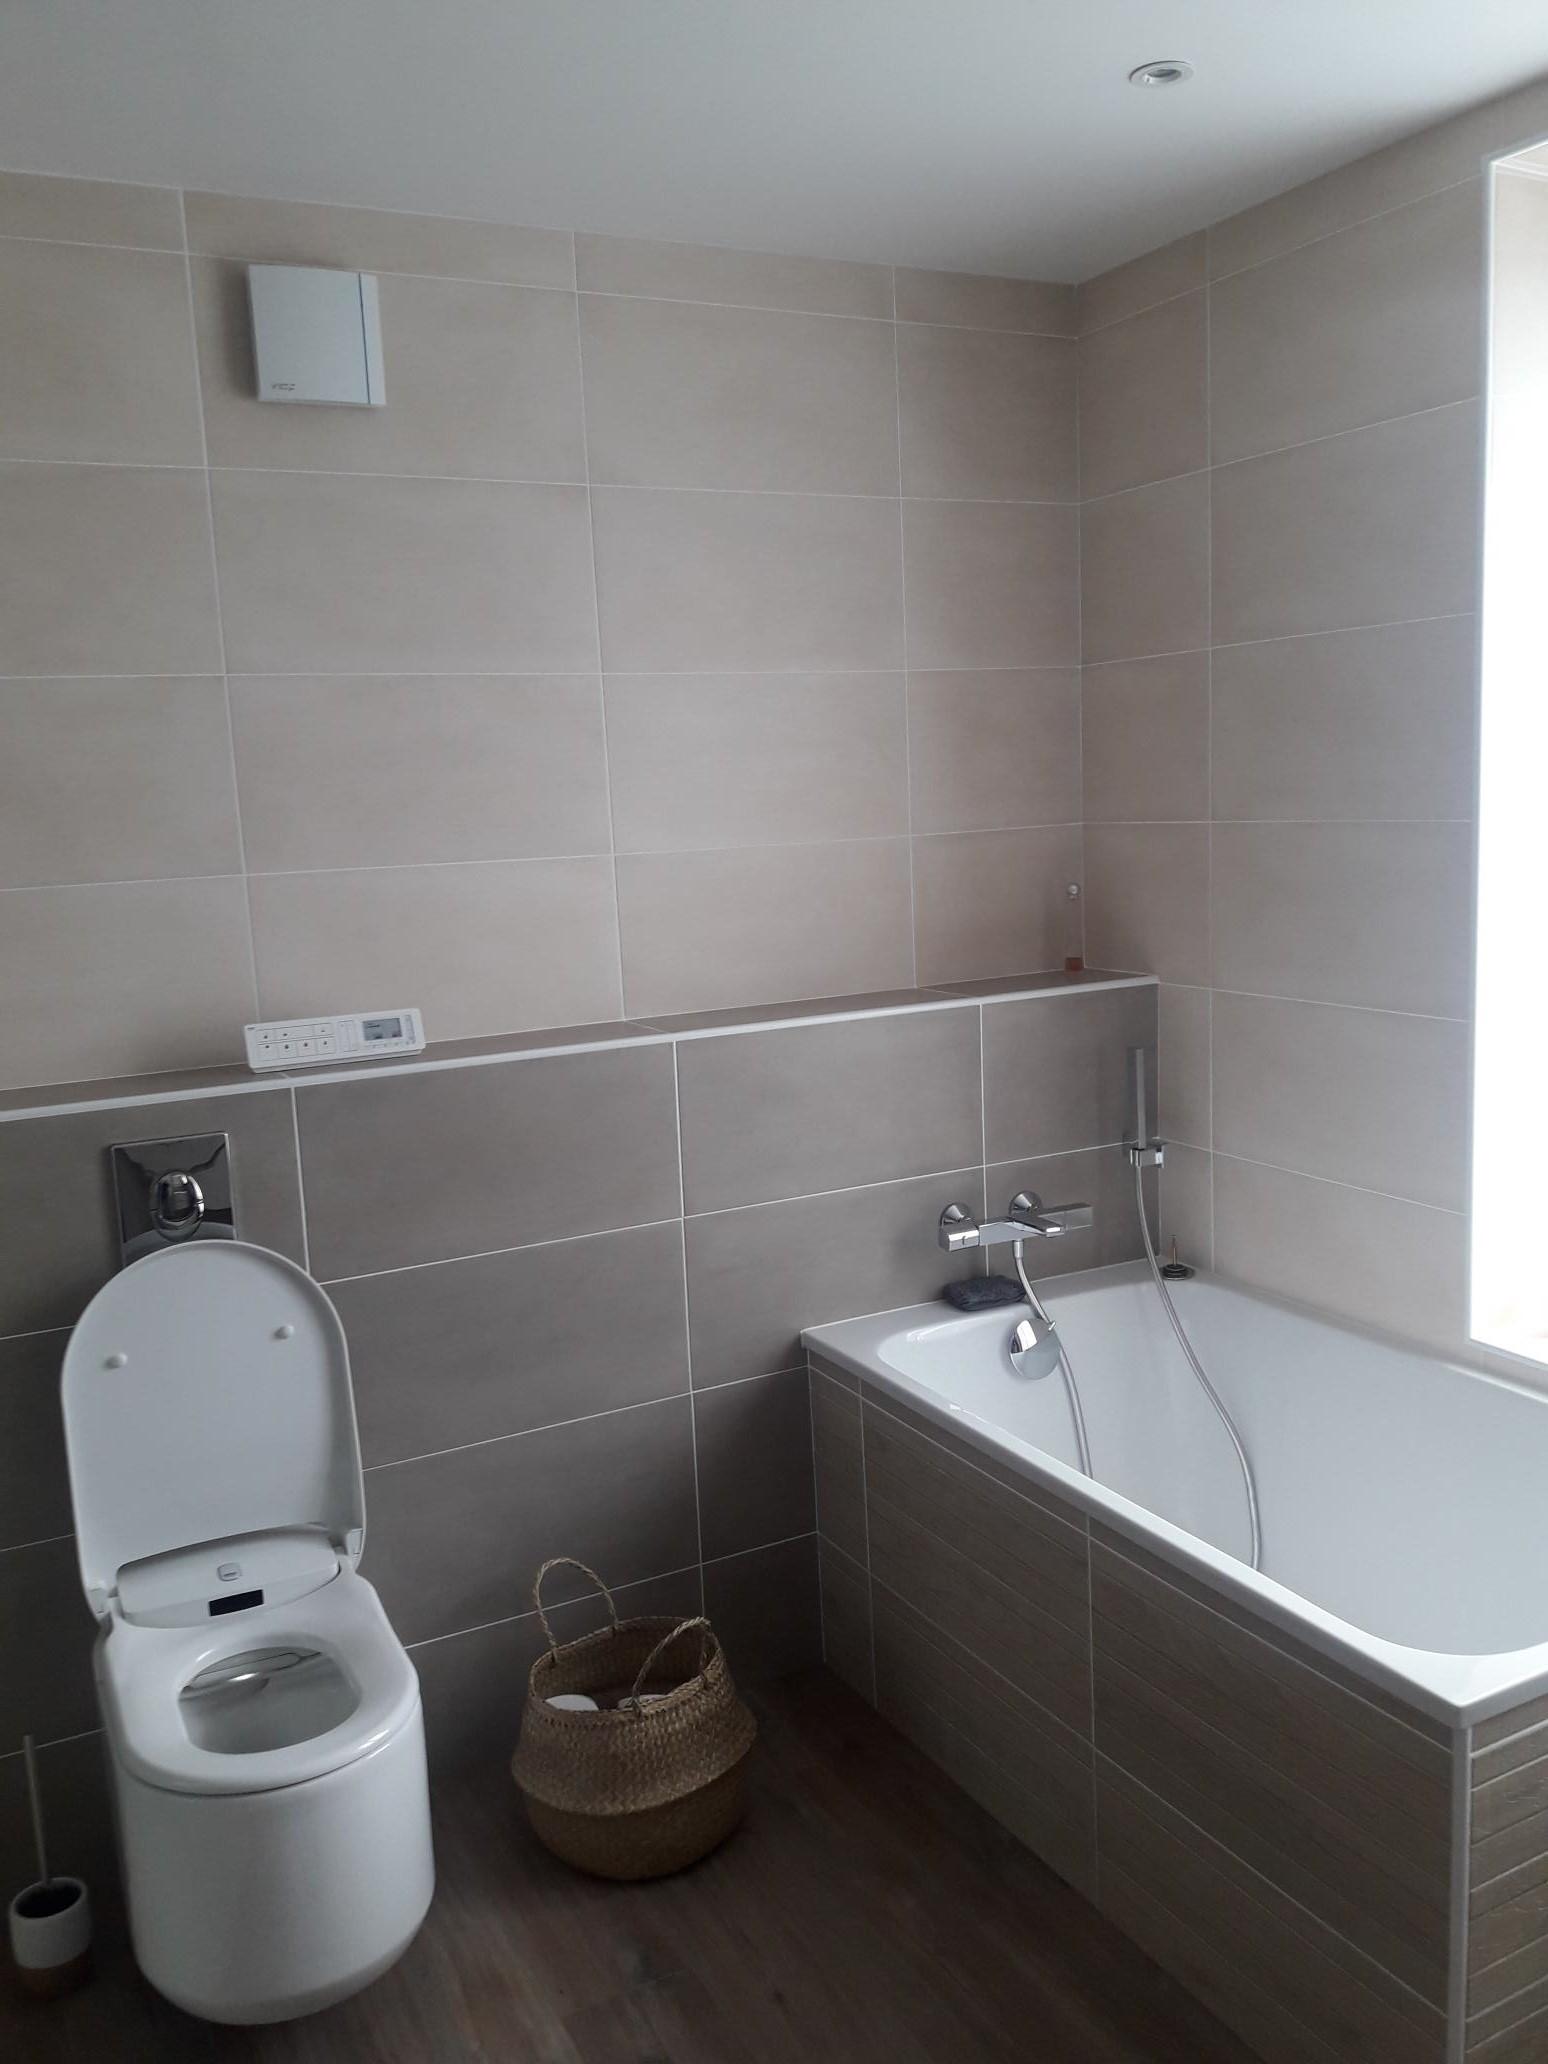 installation et r novation de salles de bains brest. Black Bedroom Furniture Sets. Home Design Ideas